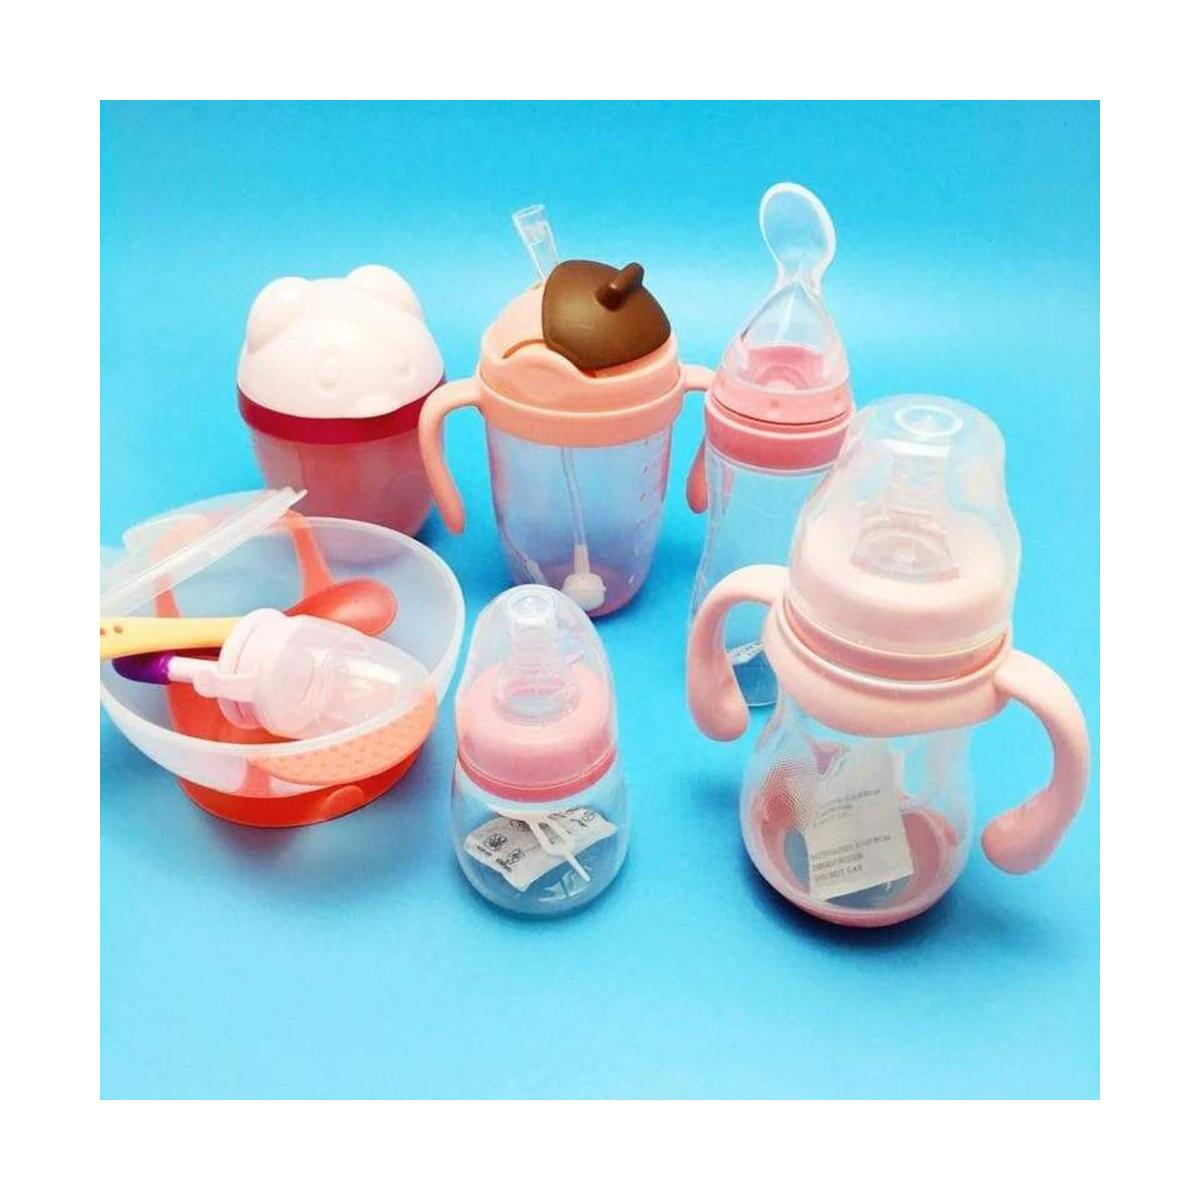 Baby Wide Neck Feeding Nursing Bottle Set